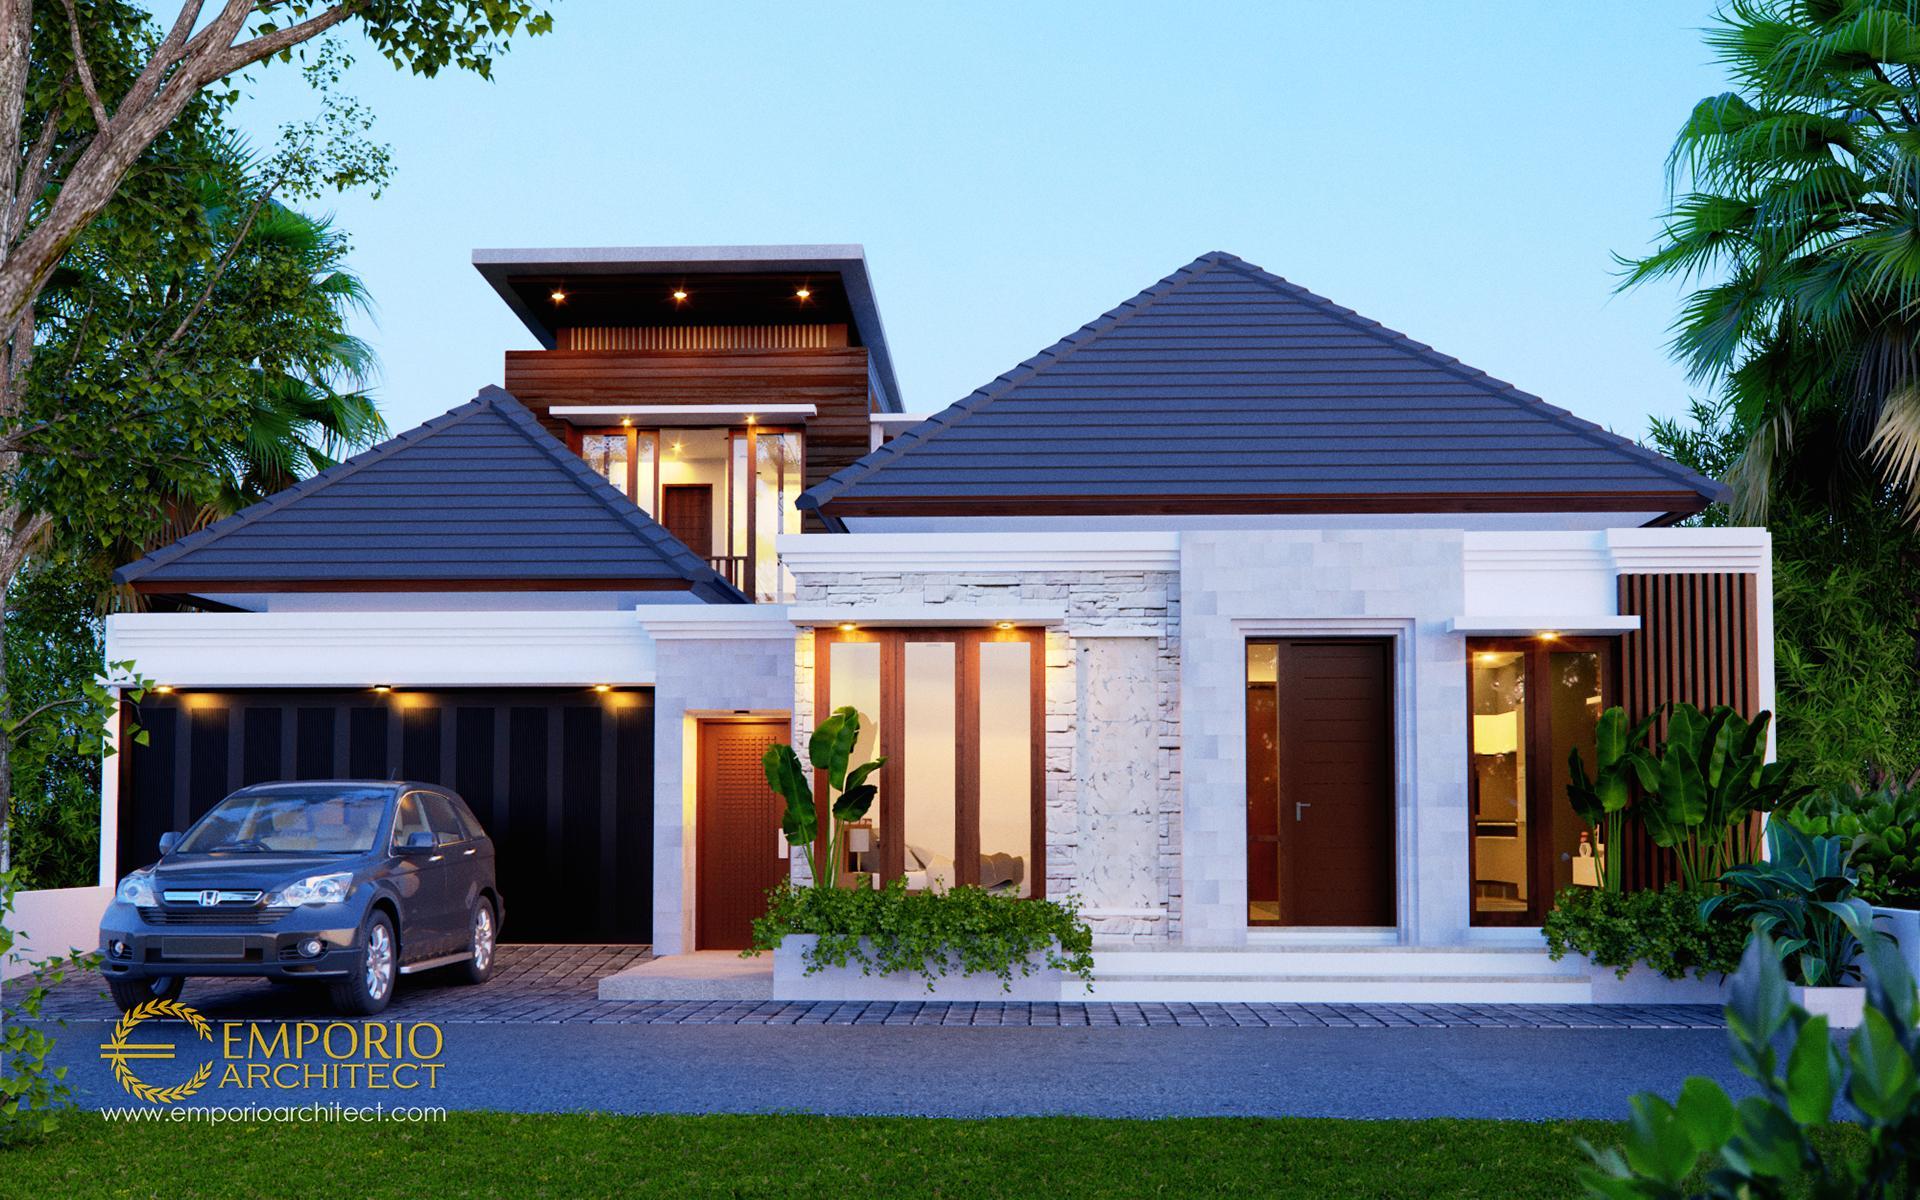 Mr. Tim & Mrs. Villa Modern House 2 Floors Design - Bintaro, Jakarta Selatan